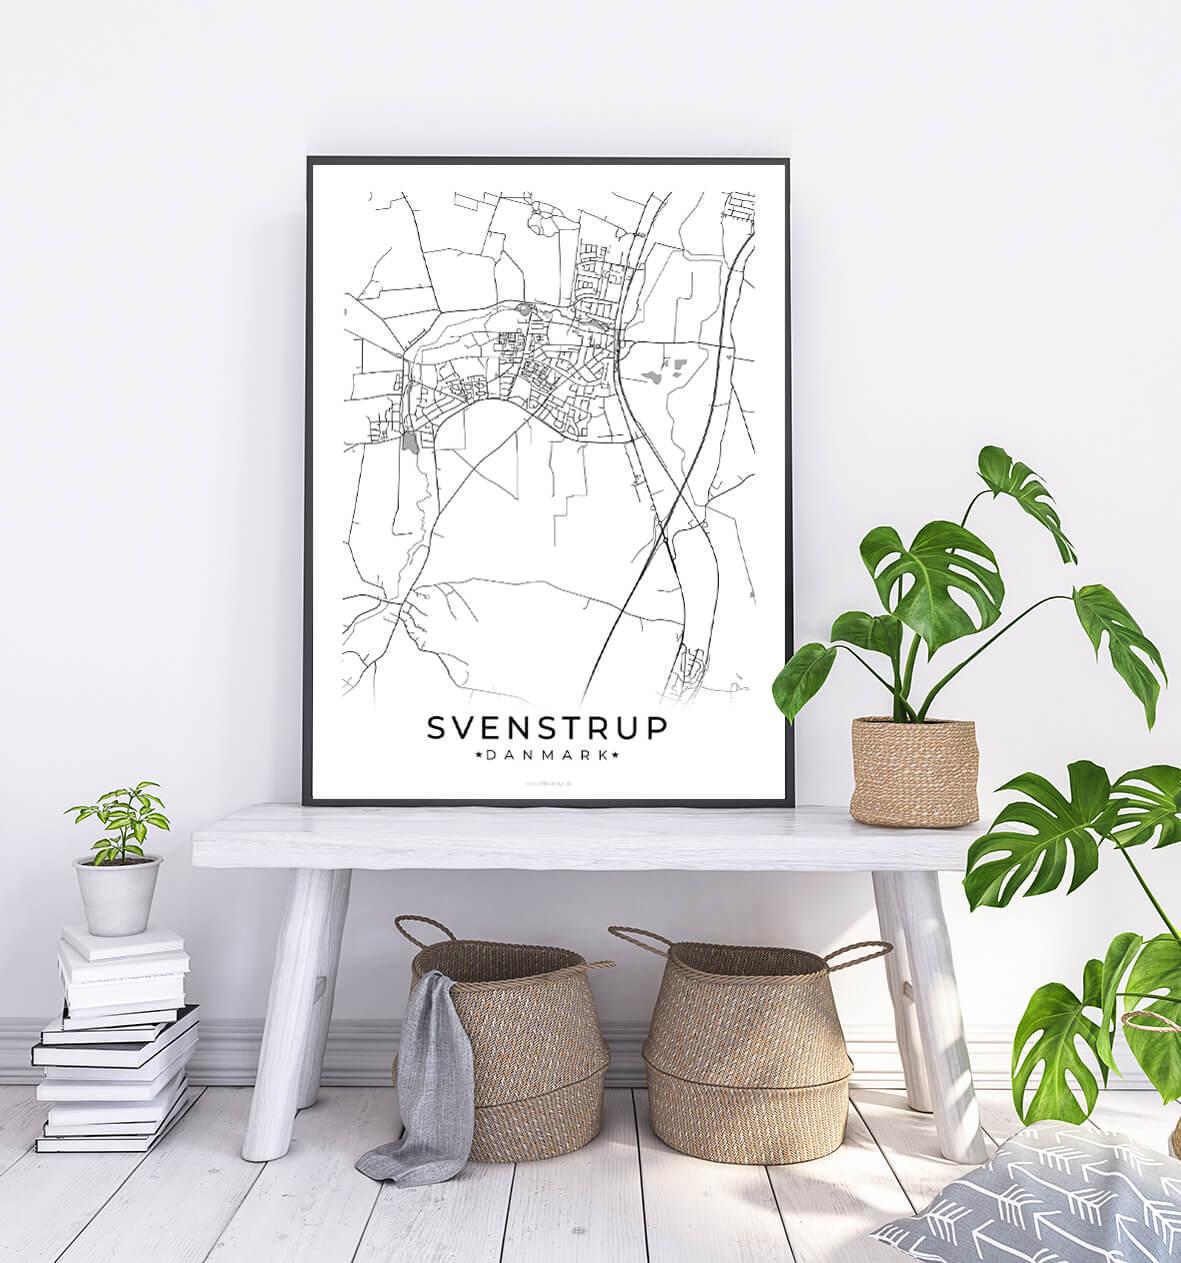 Svenstrup-hvid-byplakat-1